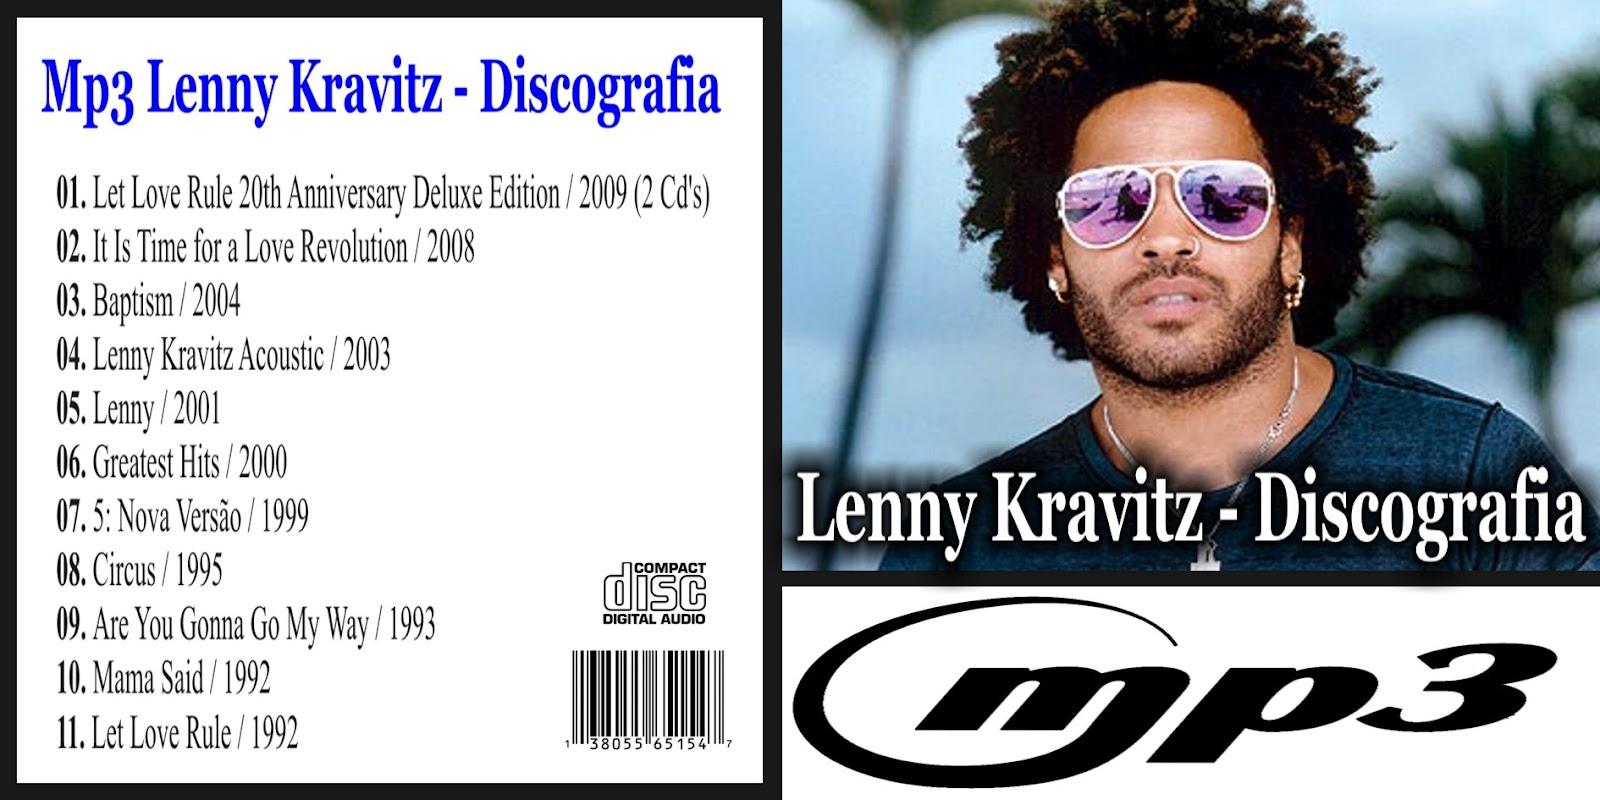 http://4.bp.blogspot.com/-5FTKwEYVa2w/T5r4cJOPA-I/AAAAAAAADLs/YScmrRKbWWU/s1600/MP3+DISCOGRAFIA+LENNY+KRAVITZ.jpg